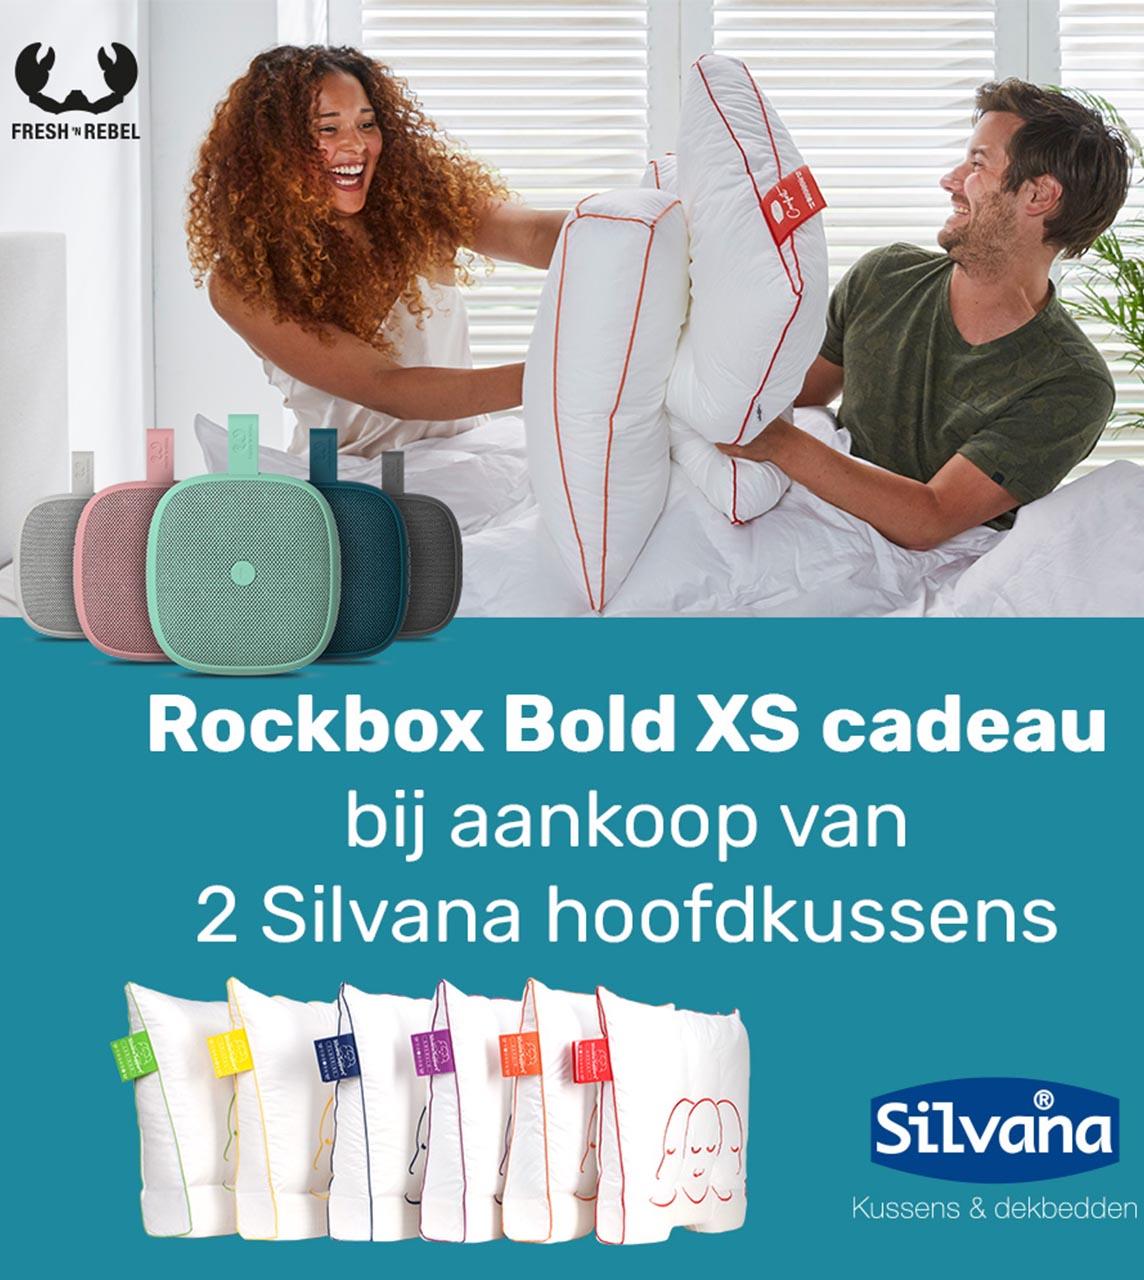 Rockbox Bold XS cadeau!